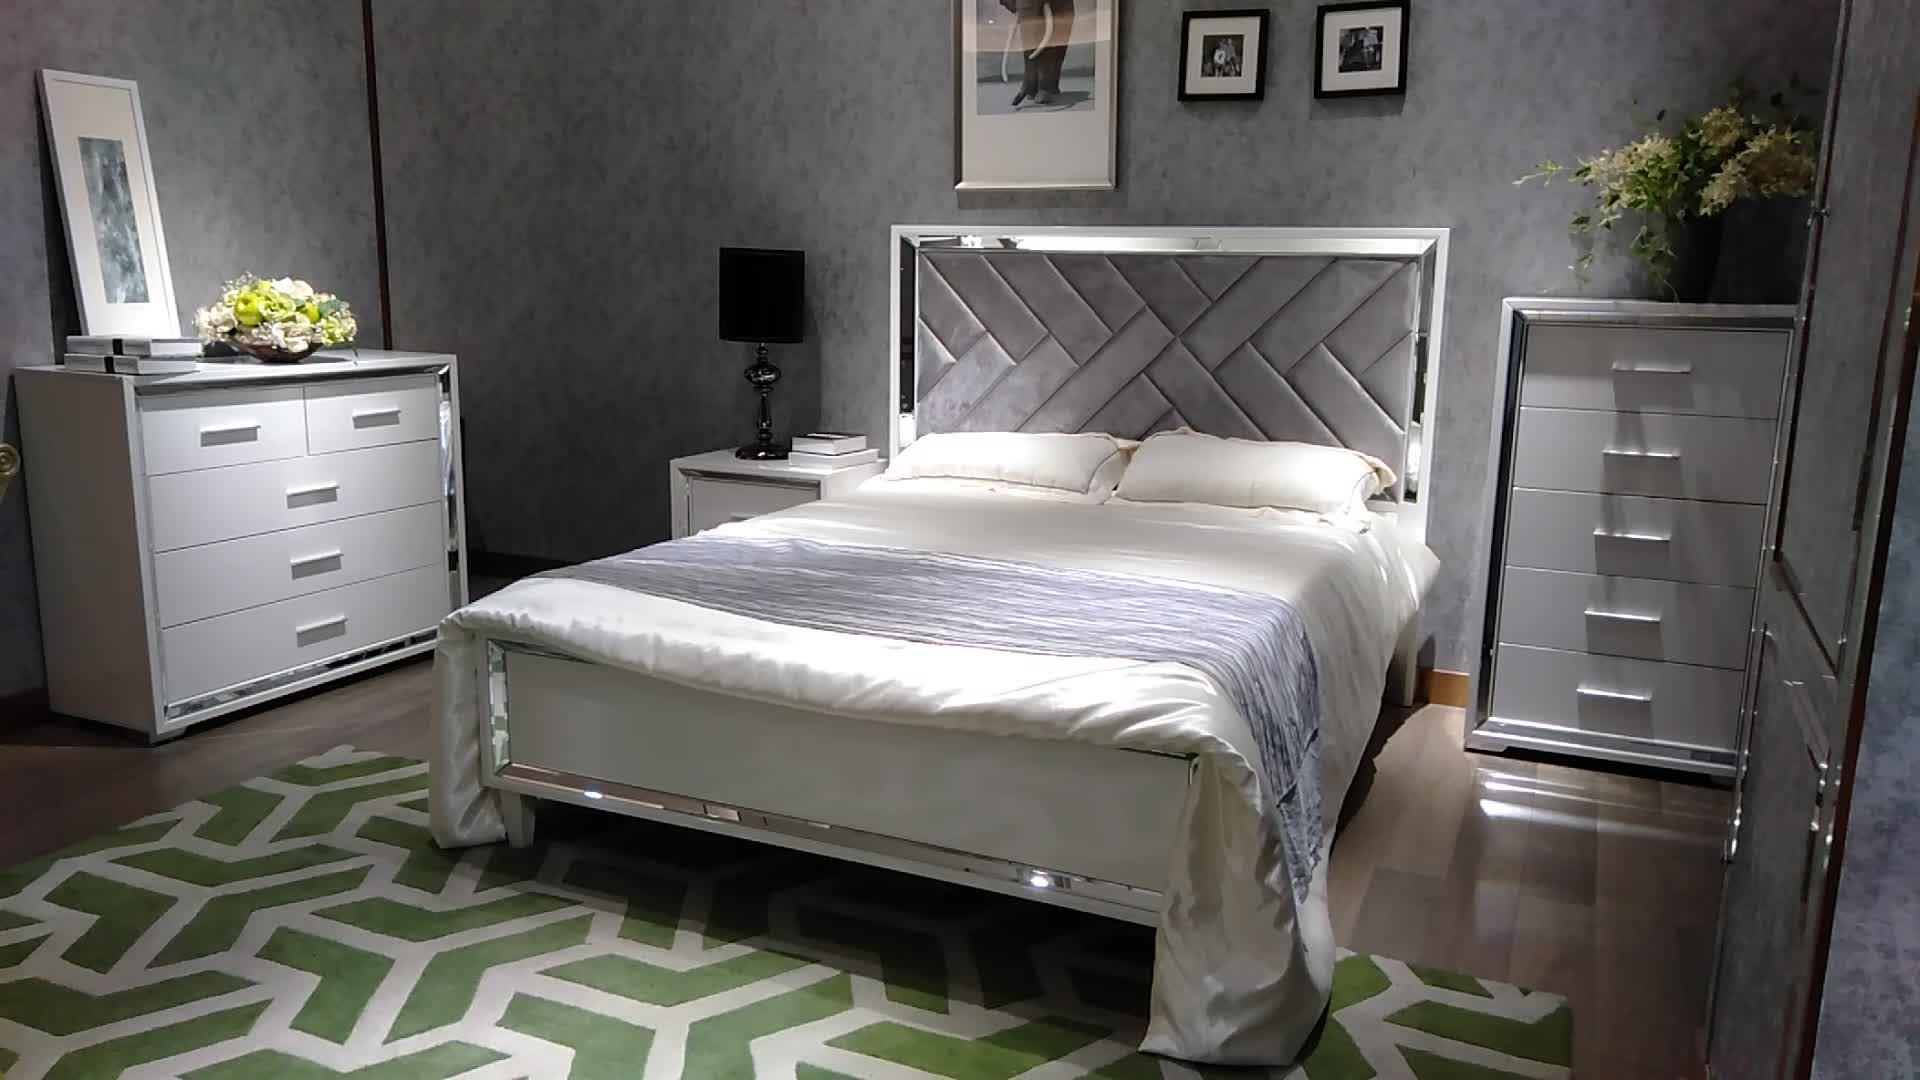 आधुनिक घर फर्नीचर बेडरूम/सभी आधुनिक बेडरूम फर्नीचर mdf/वैश्विक गर्म बिक्री बेडरूम फर्नीचर